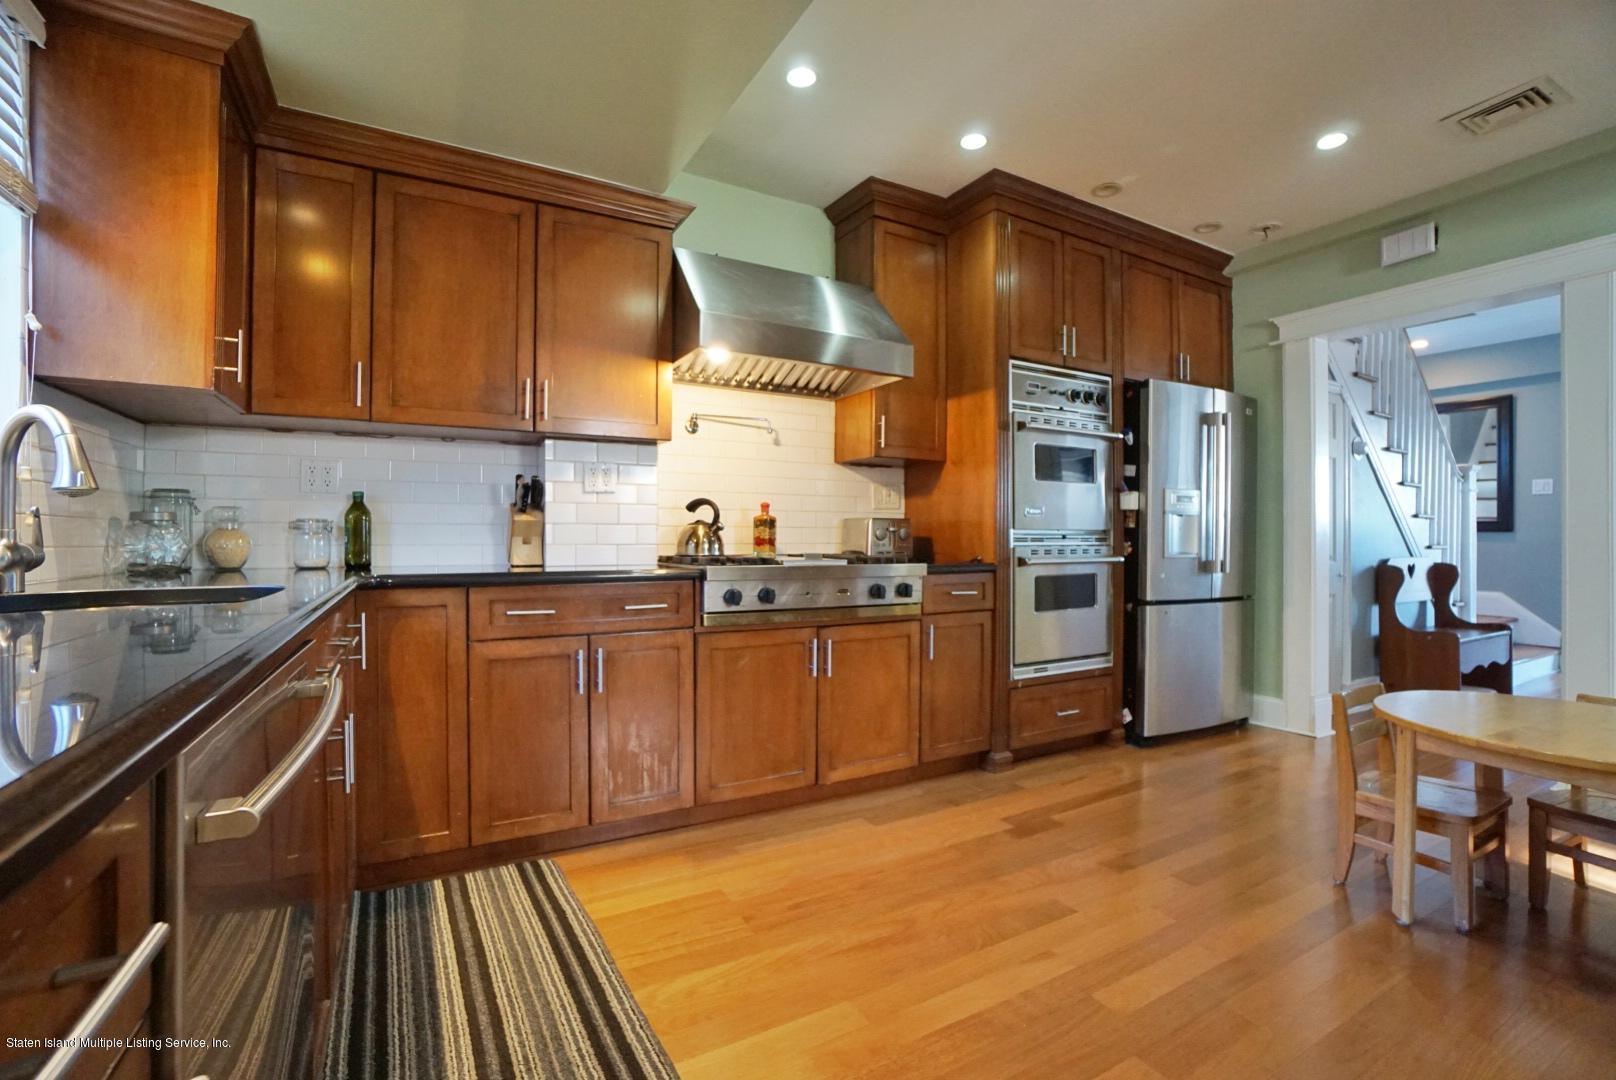 24 Starbuck Street,Staten Island,New York,10304,United States,3 Bedrooms Bedrooms,6 Rooms Rooms,4 BathroomsBathrooms,Residential,Starbuck,1133893